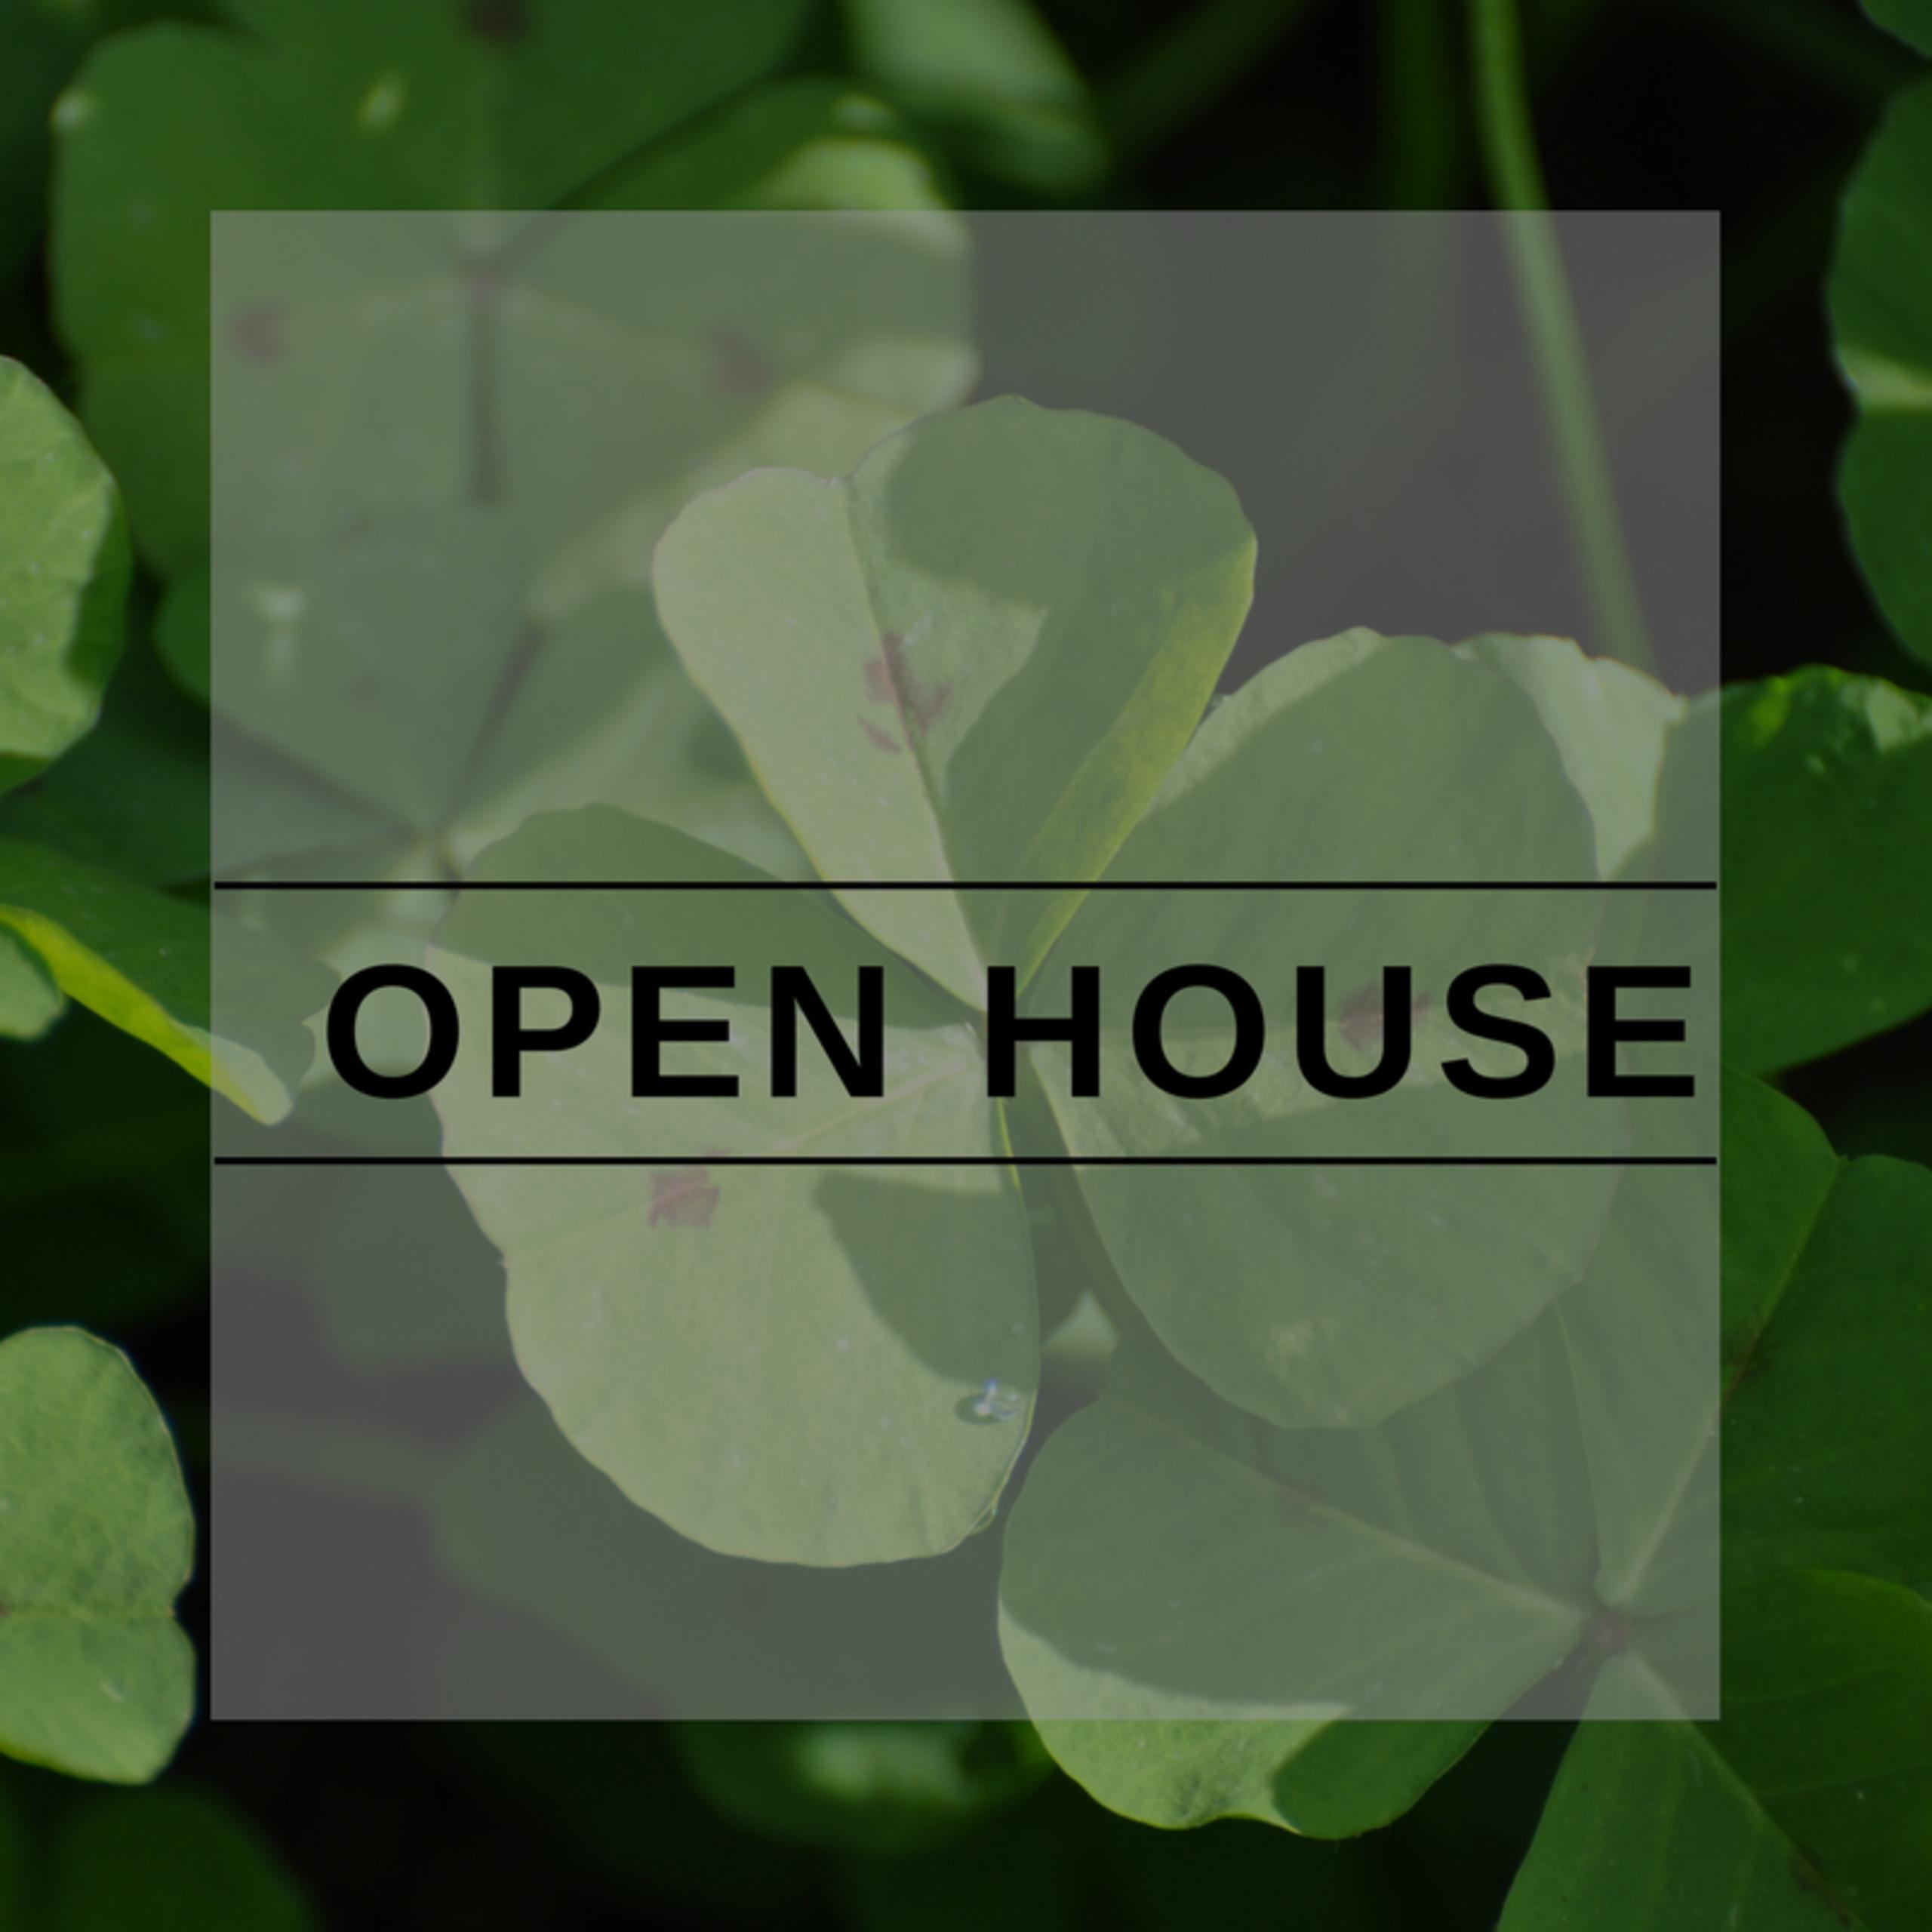 OPEN HOUSE LIST 3/17/18 – 3/18/18